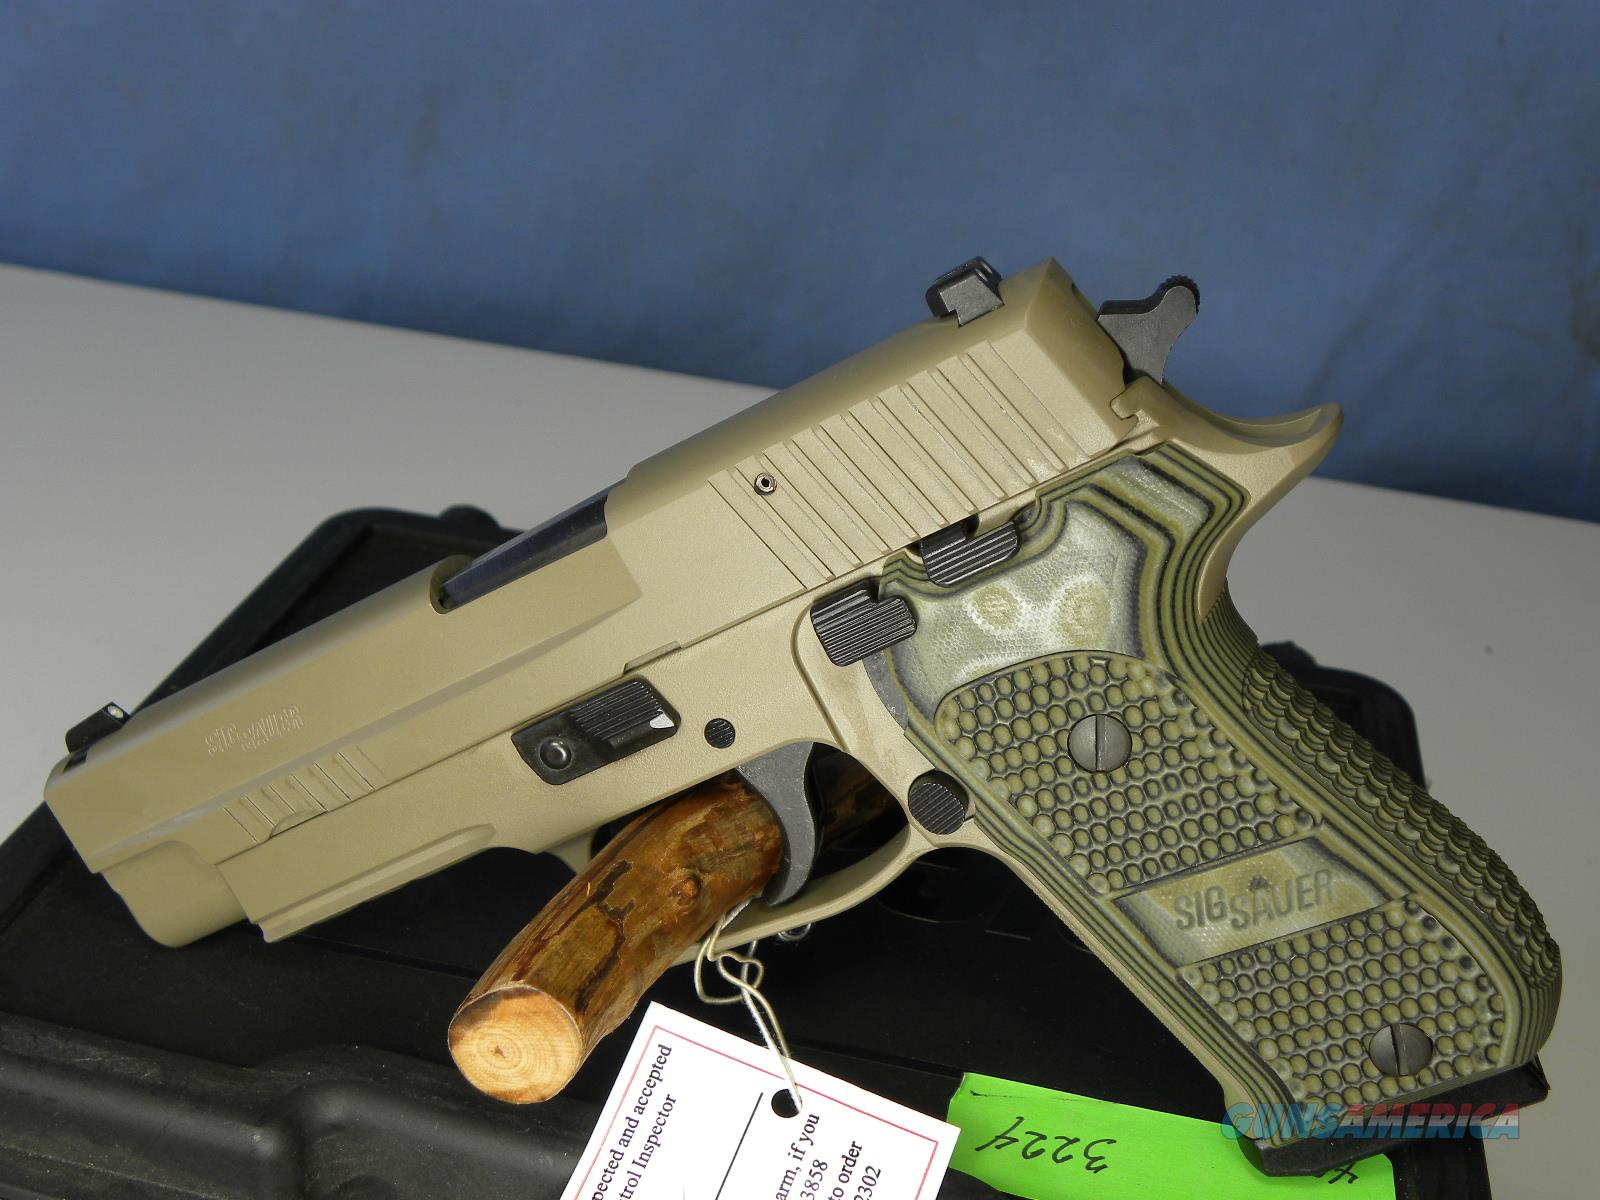 Sig Sauer 220R 45 Scorpion Elite  Guns > Pistols > Sig - Sauer/Sigarms Pistols > P220